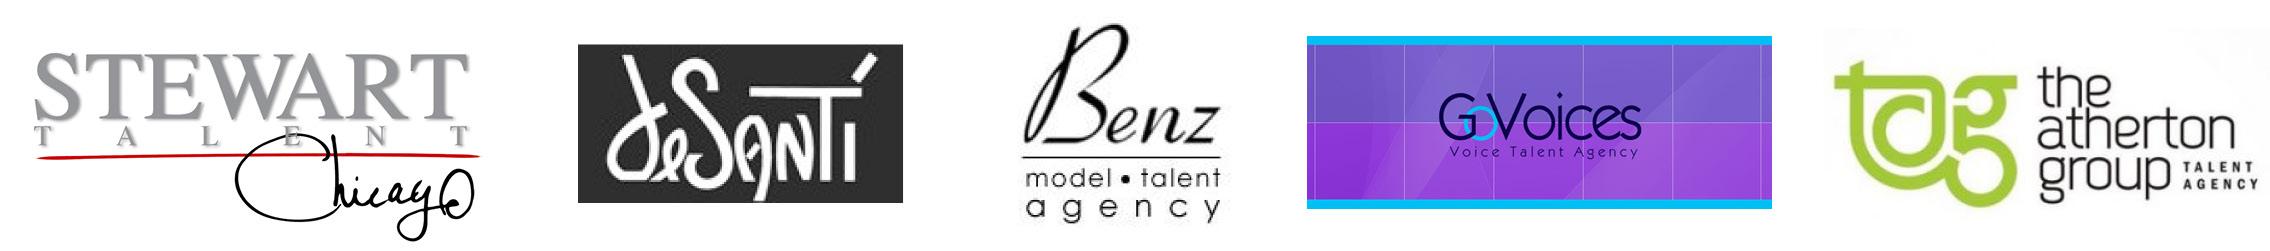 Representation company logos